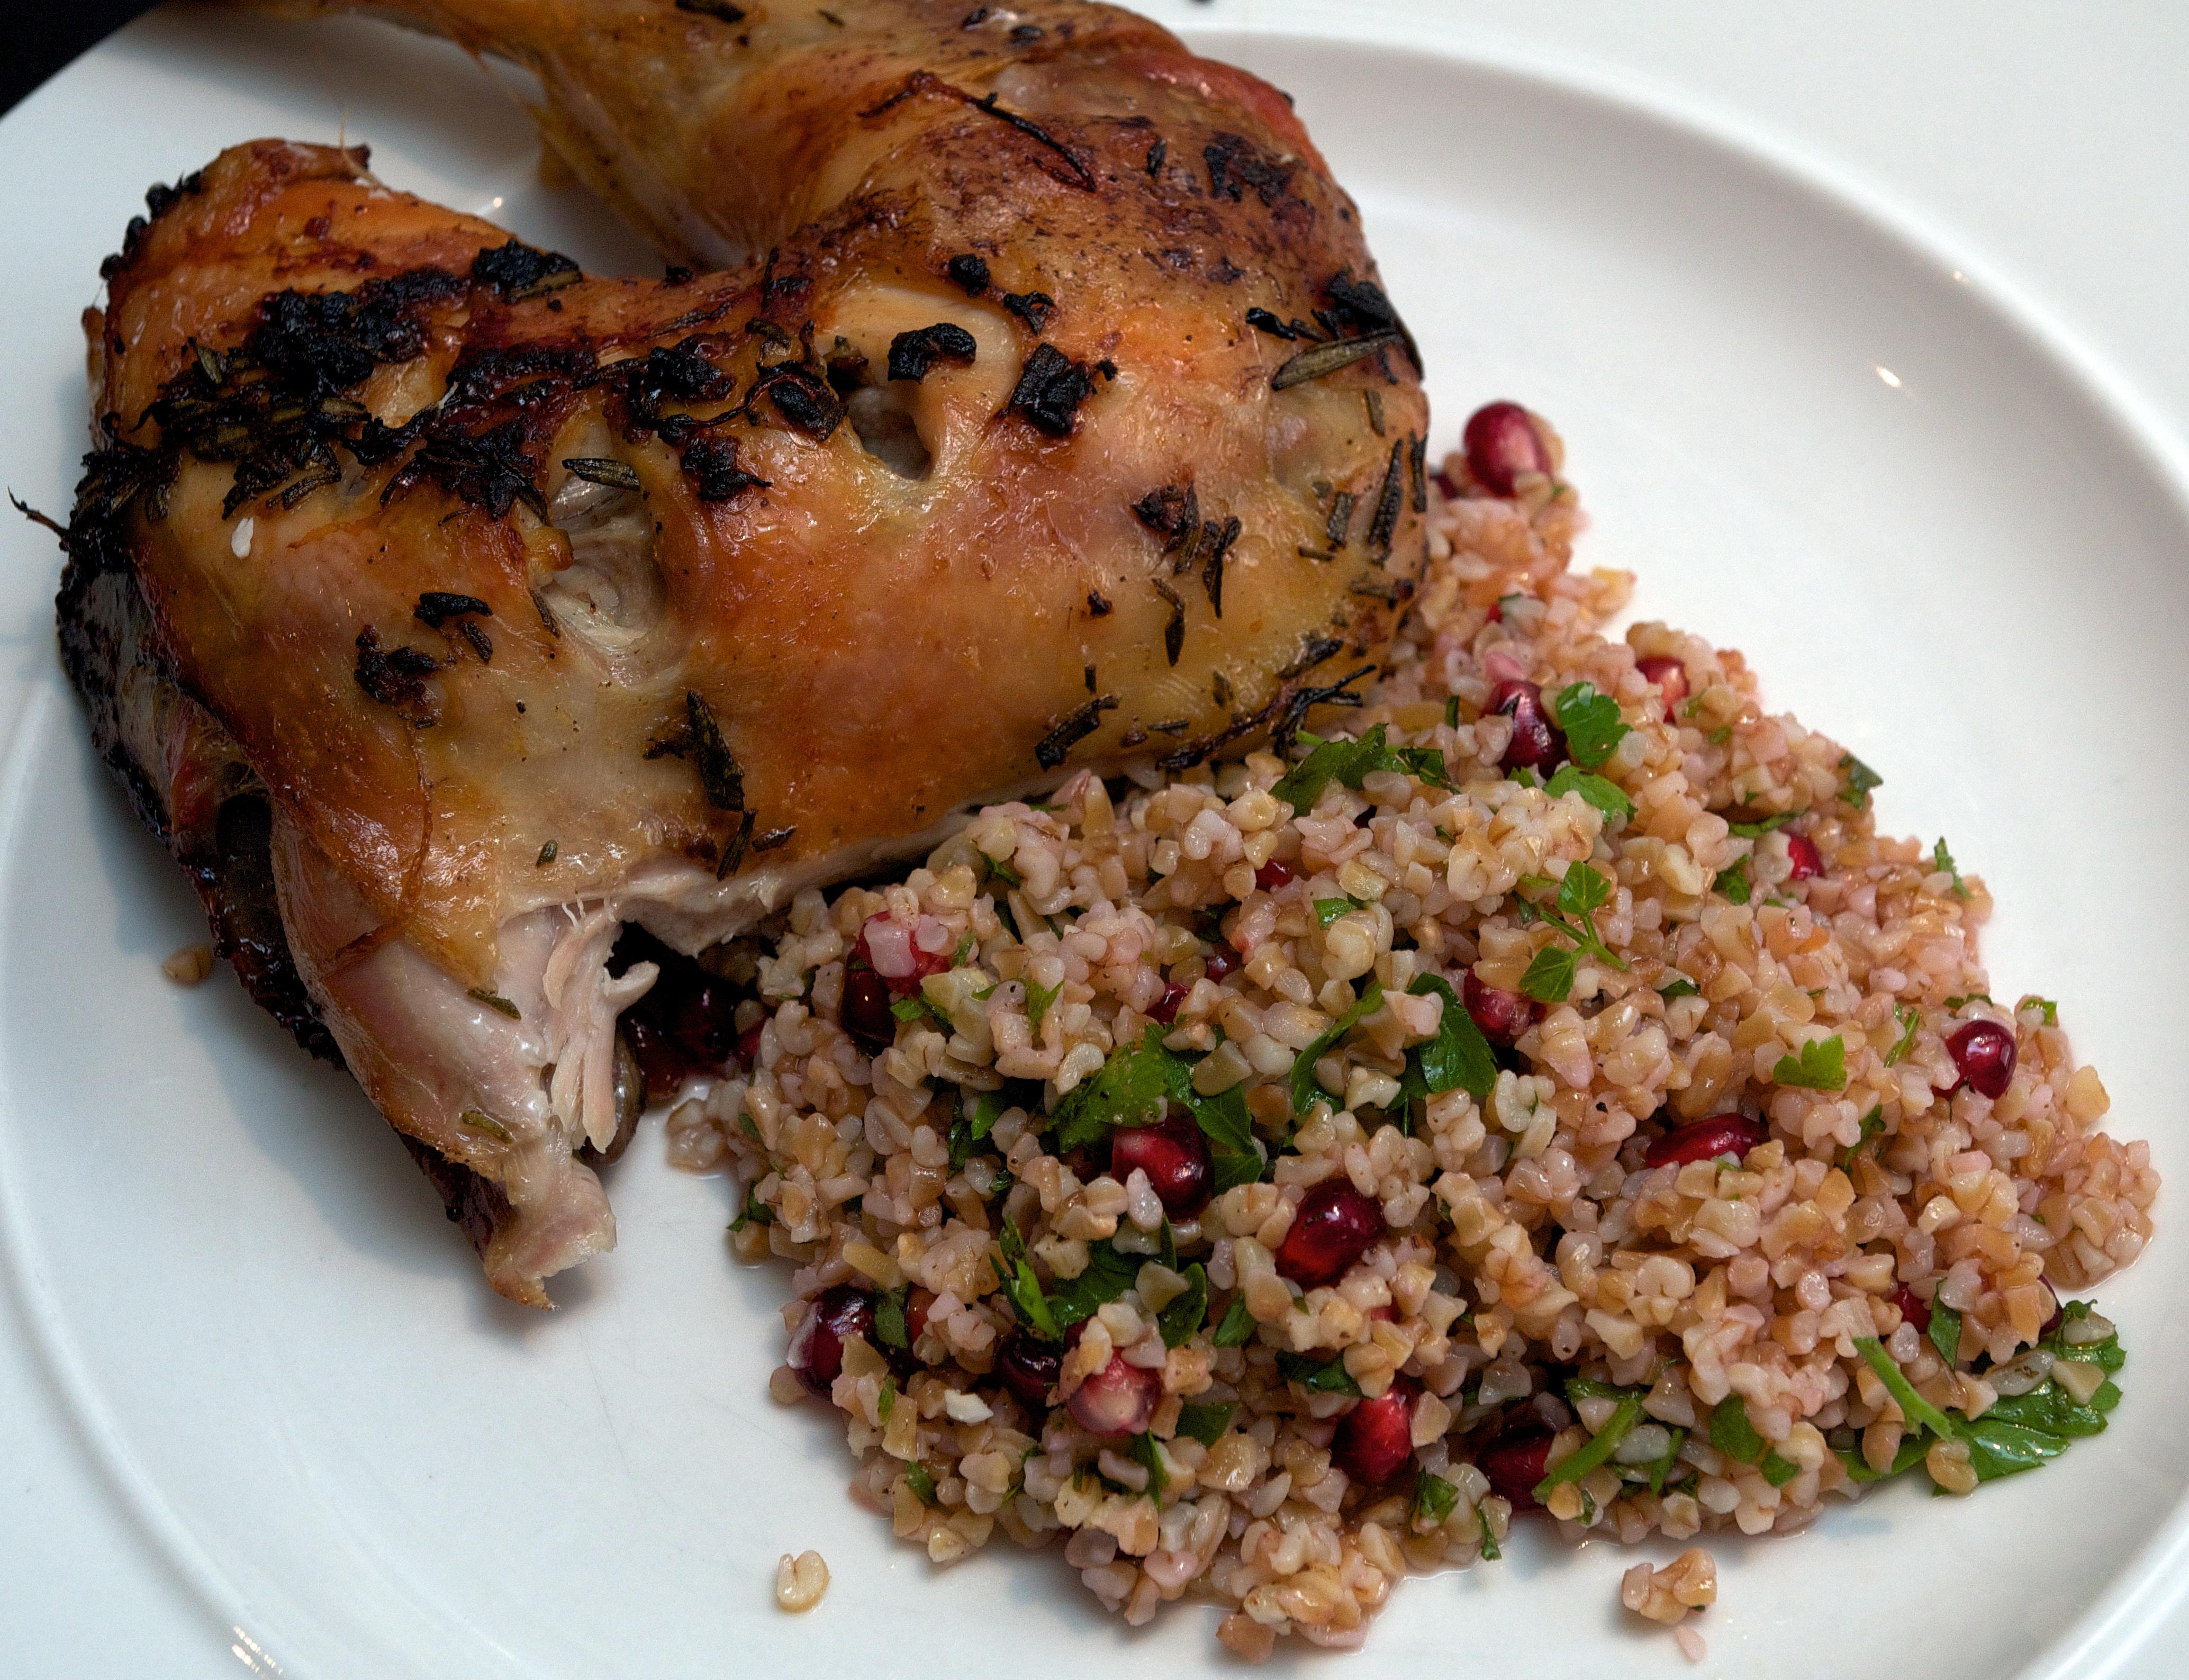 Rosemary & garlic spatchcock chicken with bulgur wheat salad